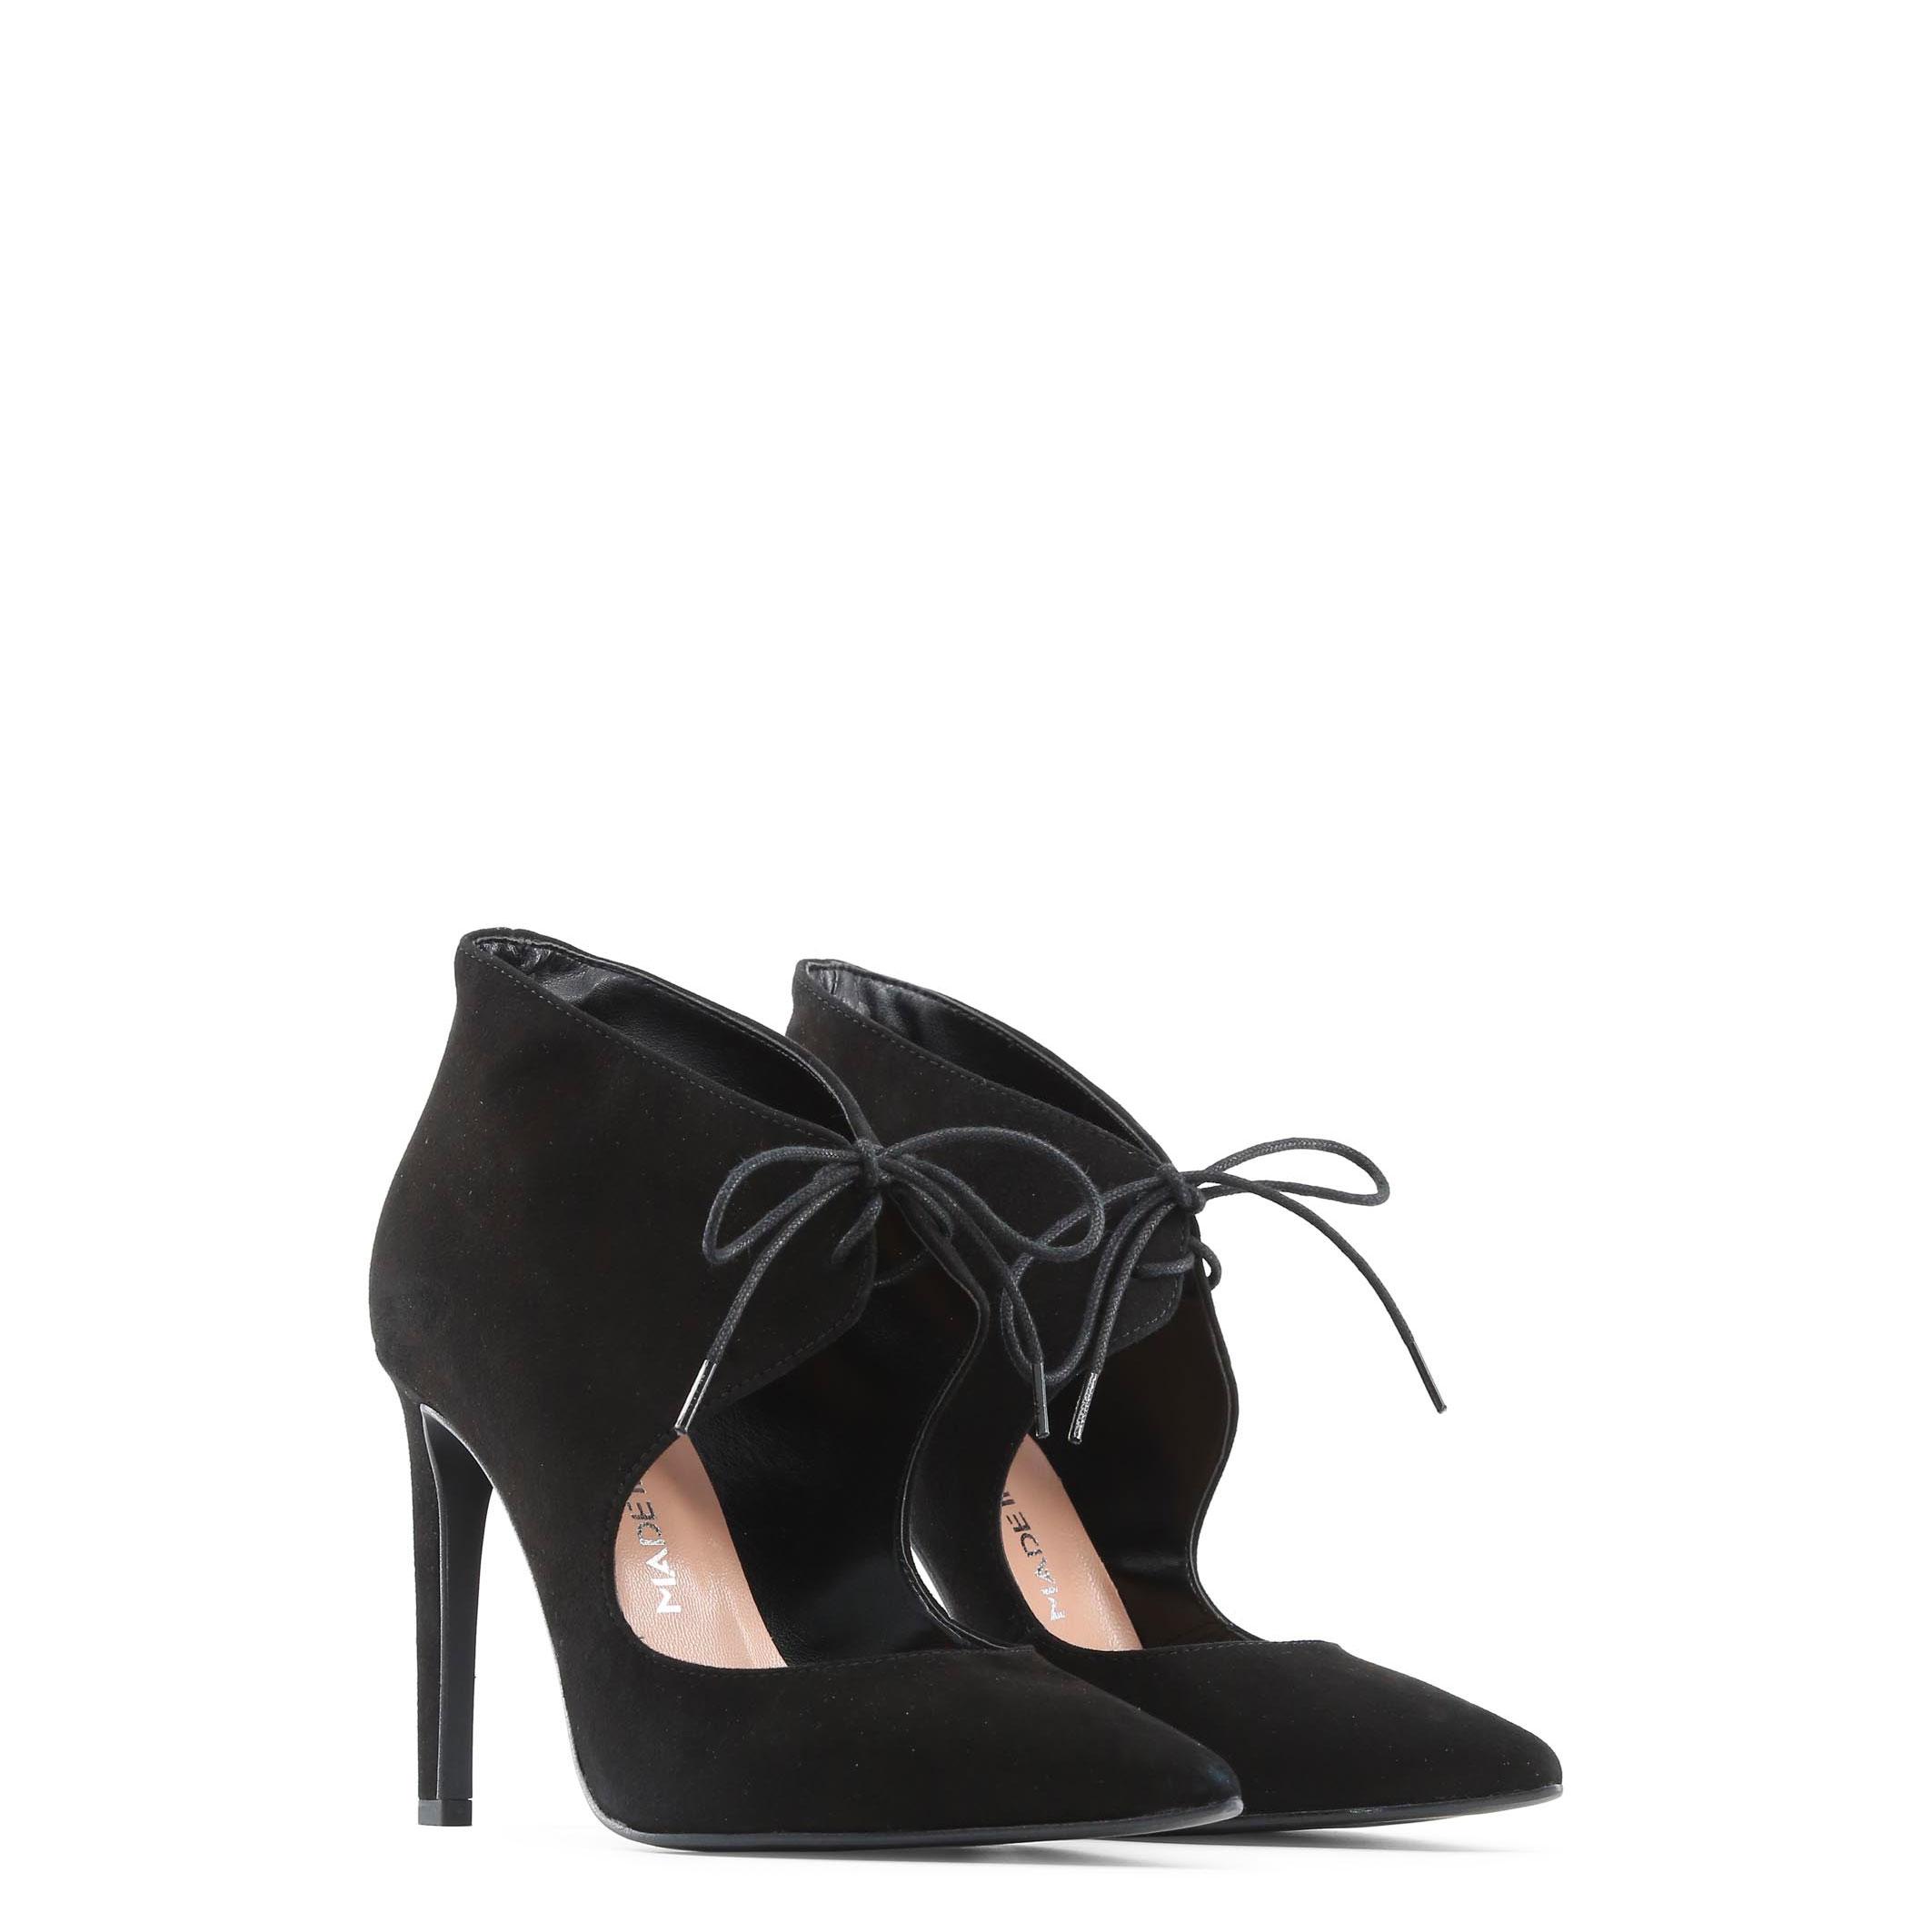 Schuhe ROSSANA, top Damen Stiefeletten Rot/Schwarz high top ROSSANA, Stiefel 9f76df